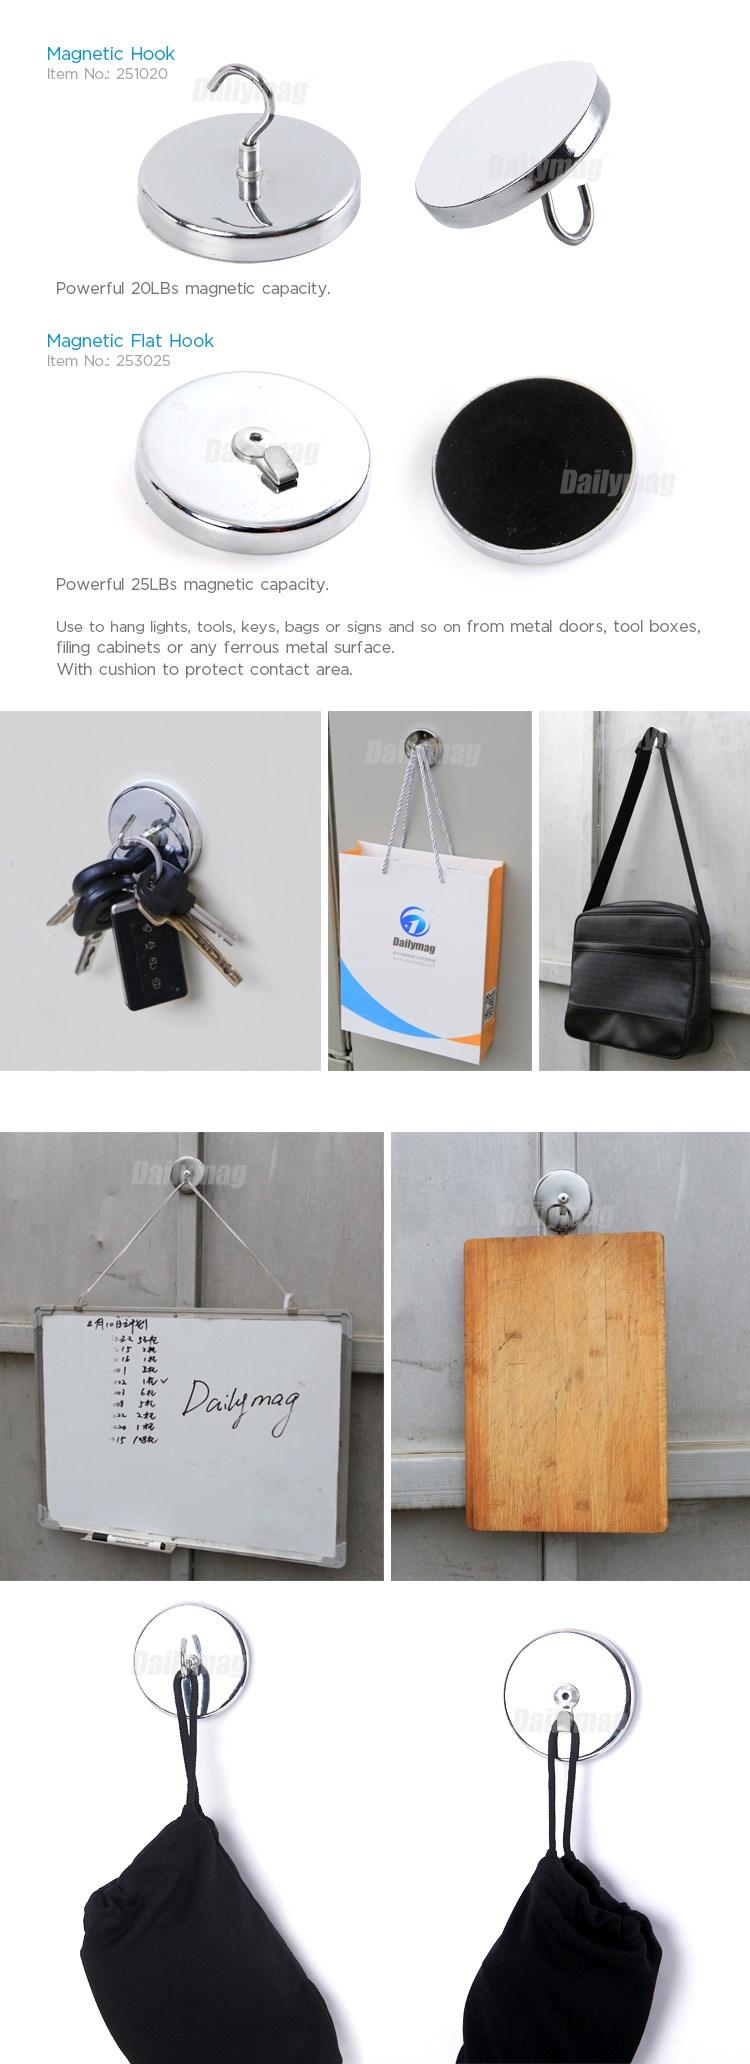 251020 253025 magnetic hook+ 20LBS Magnetic Hook -- Magnetic Clip Refridge Door Cloths Hanger Key Holder.jpg